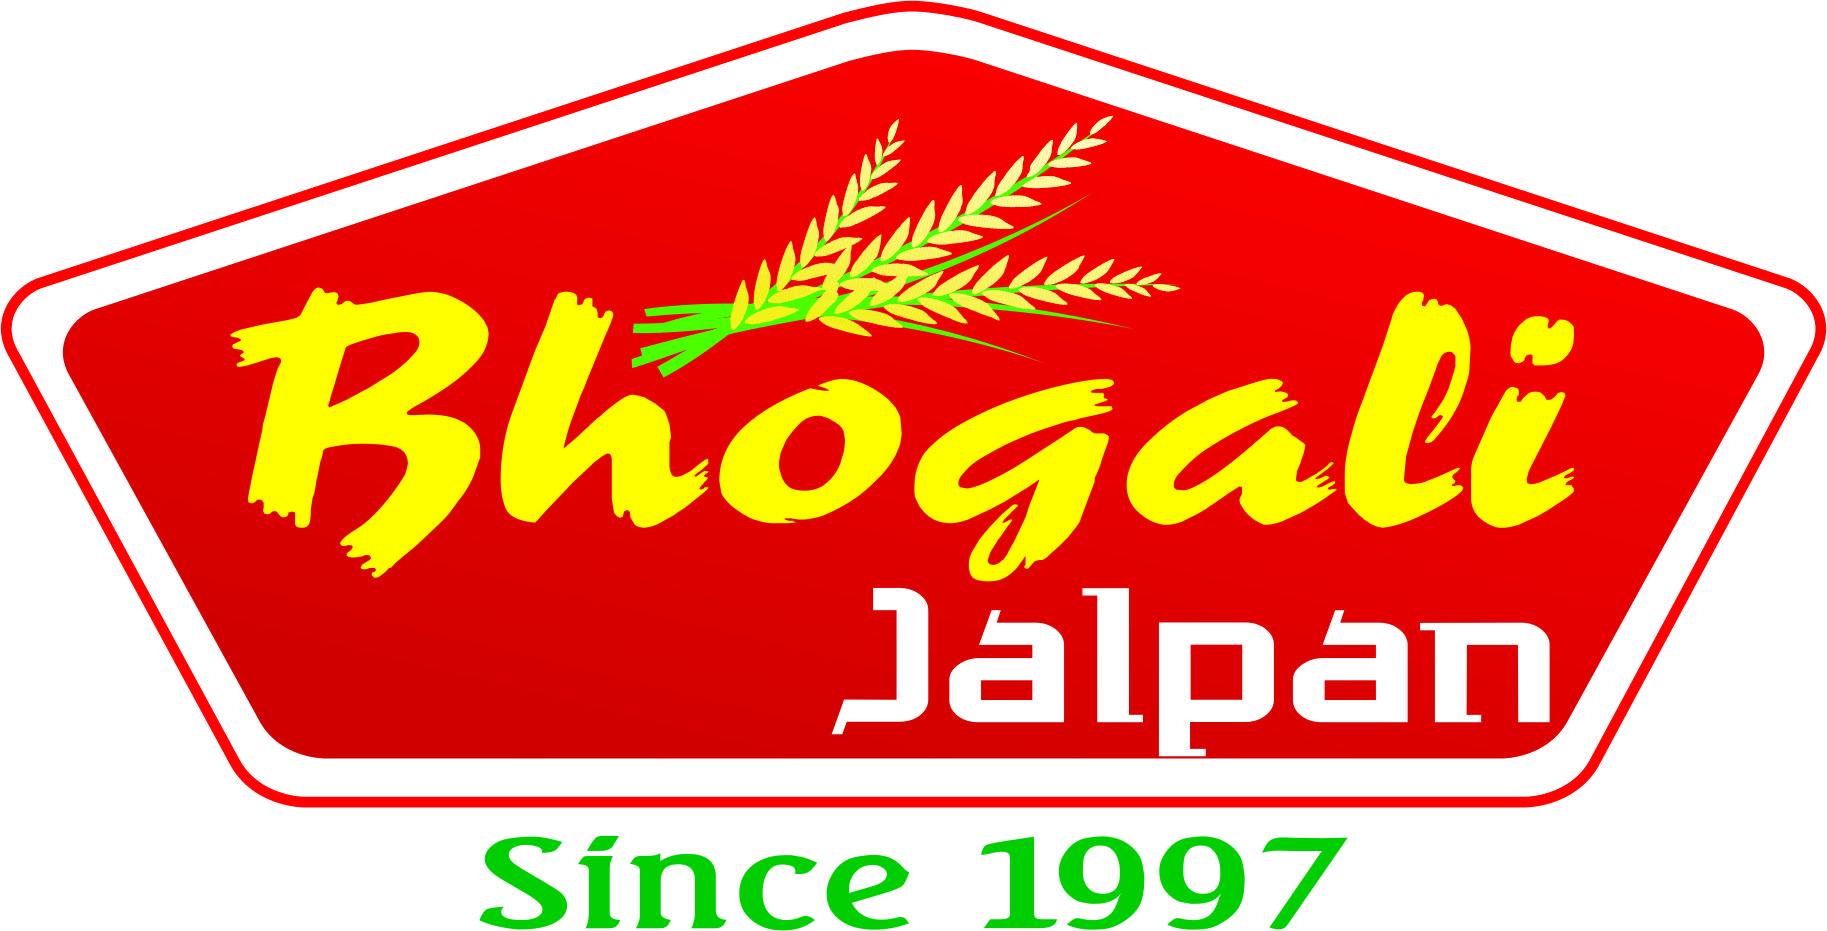 Bhogali Food Products Pvt Ltd - logo